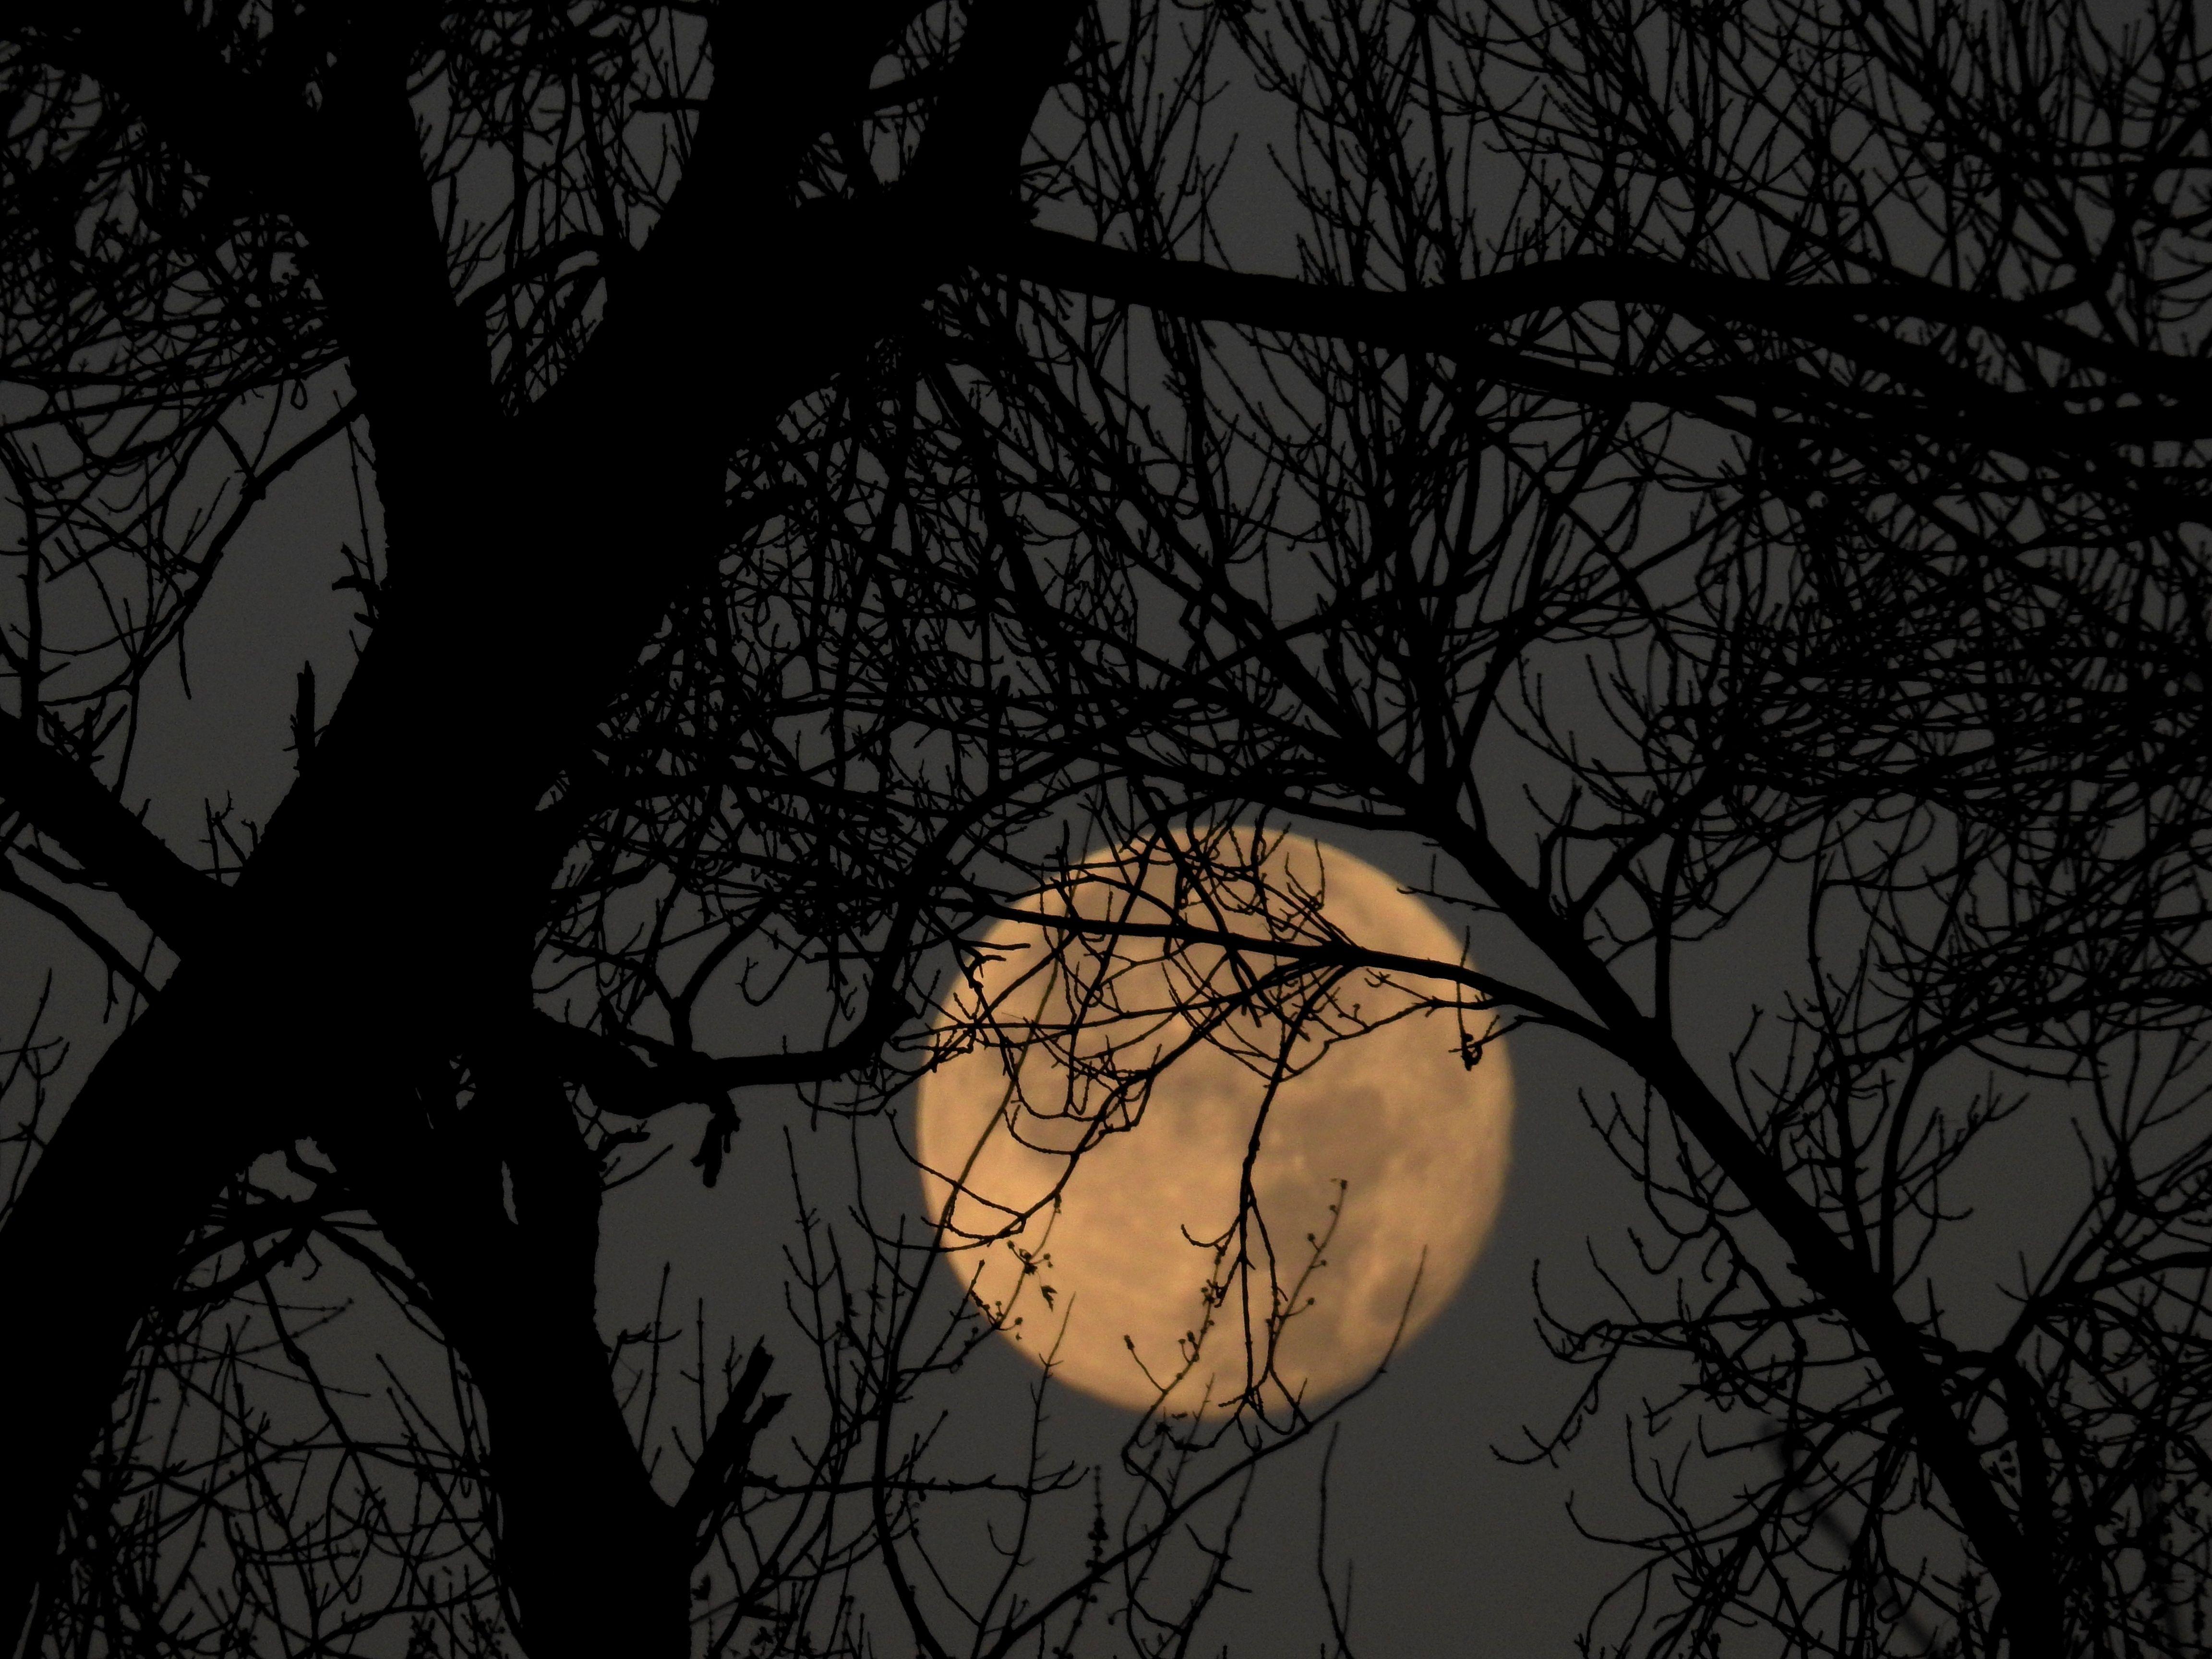 Super Moon Nov 14 2016 by Ken Groezinger